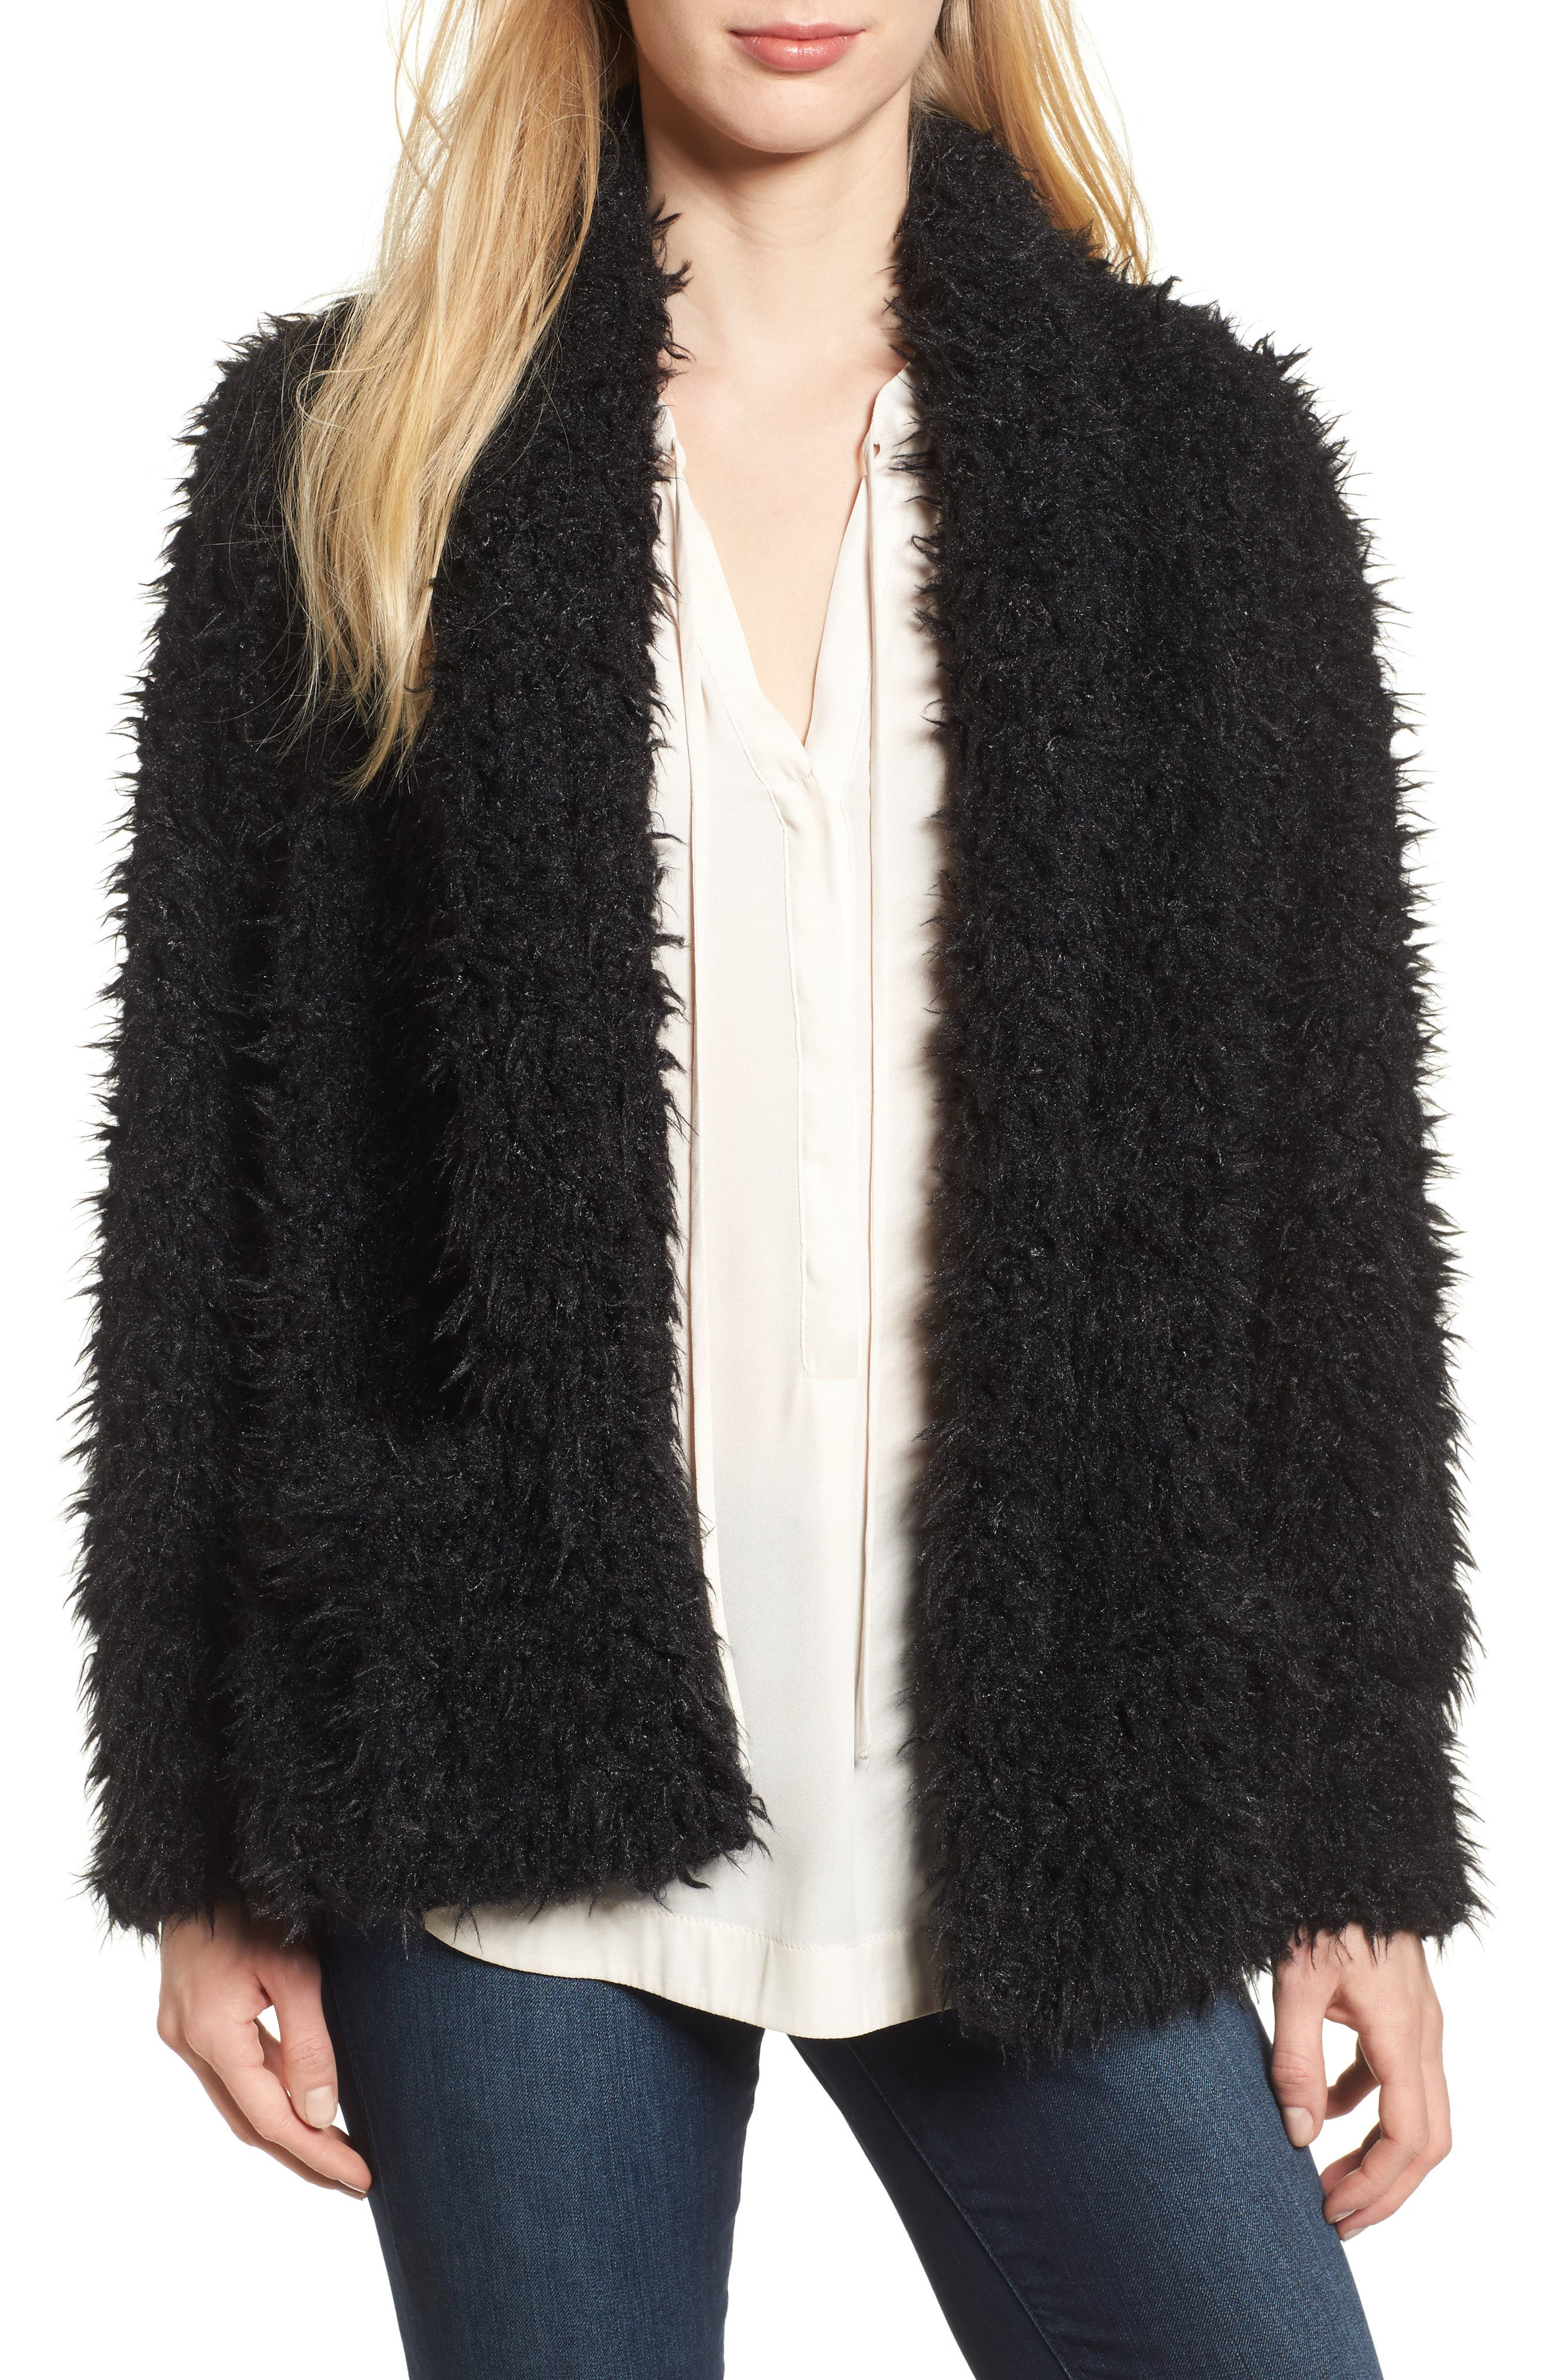 Main Image - Love, Fire Faux Fur Jacket